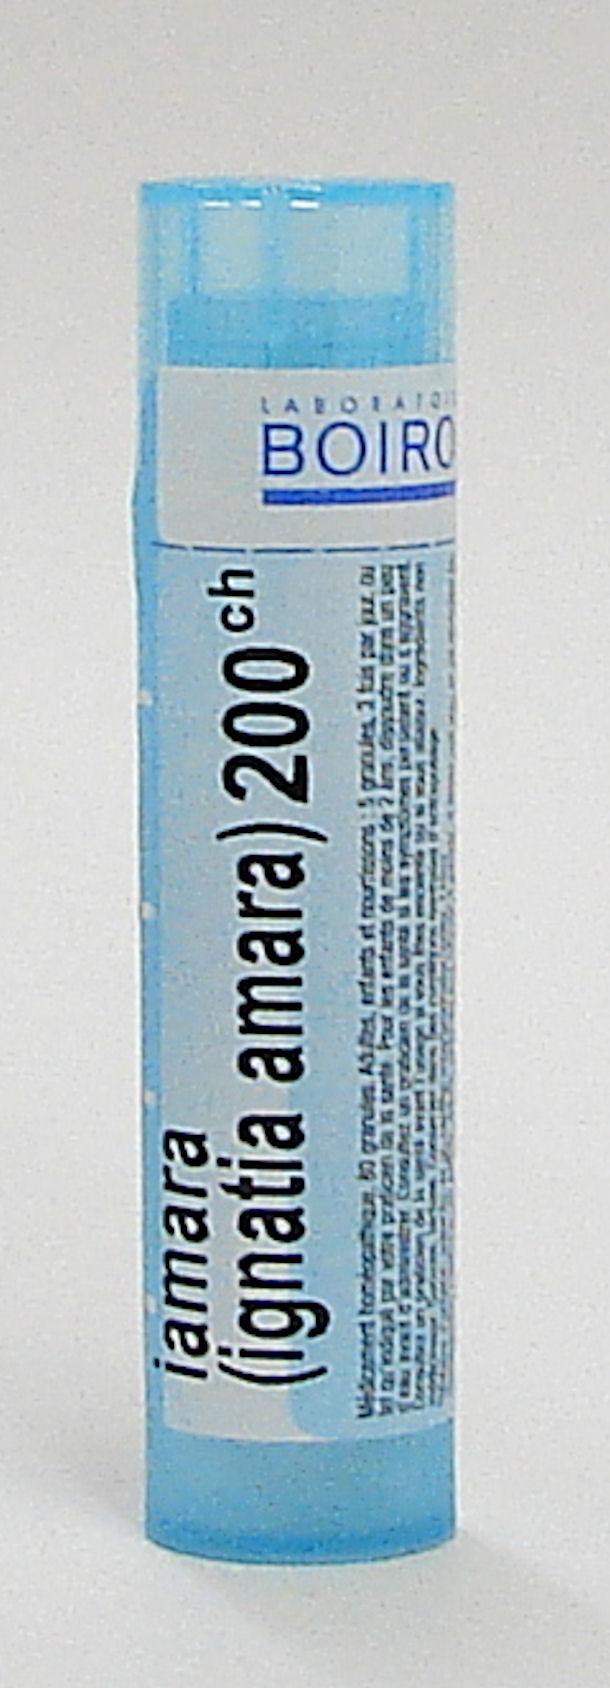 iamara (ignatia amara) 200ch sublingual pellets (boiron)